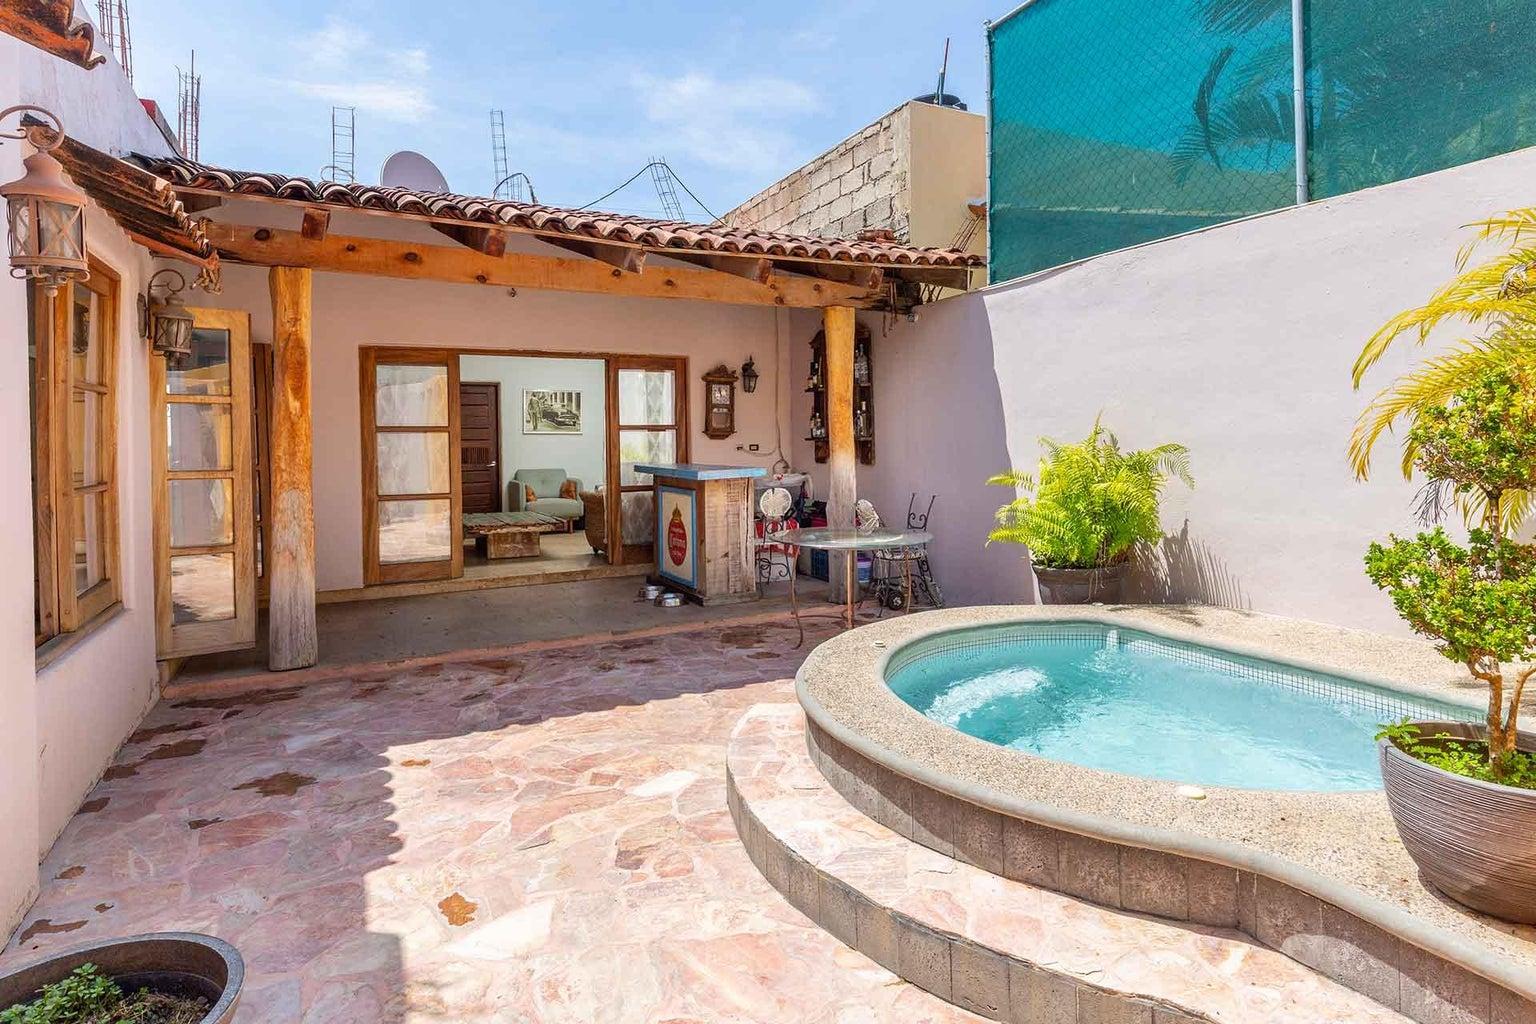 2bedroom-intown-sanpancho-mexico